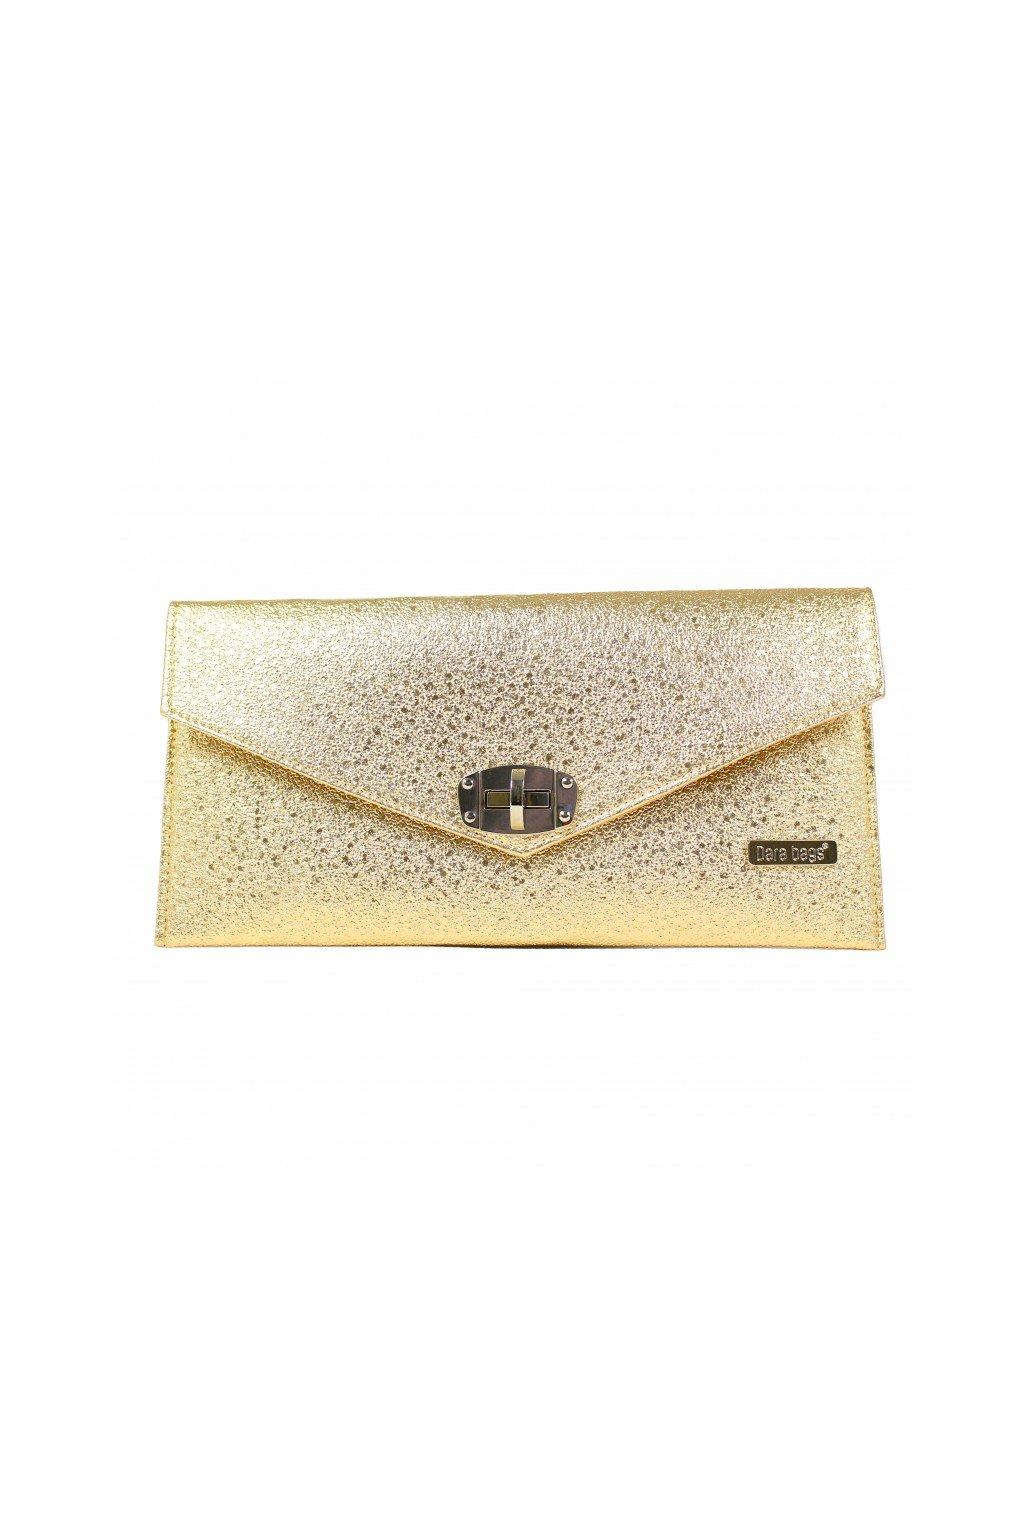 Mala trpytiva kabelka Malibu Classy zlata 1